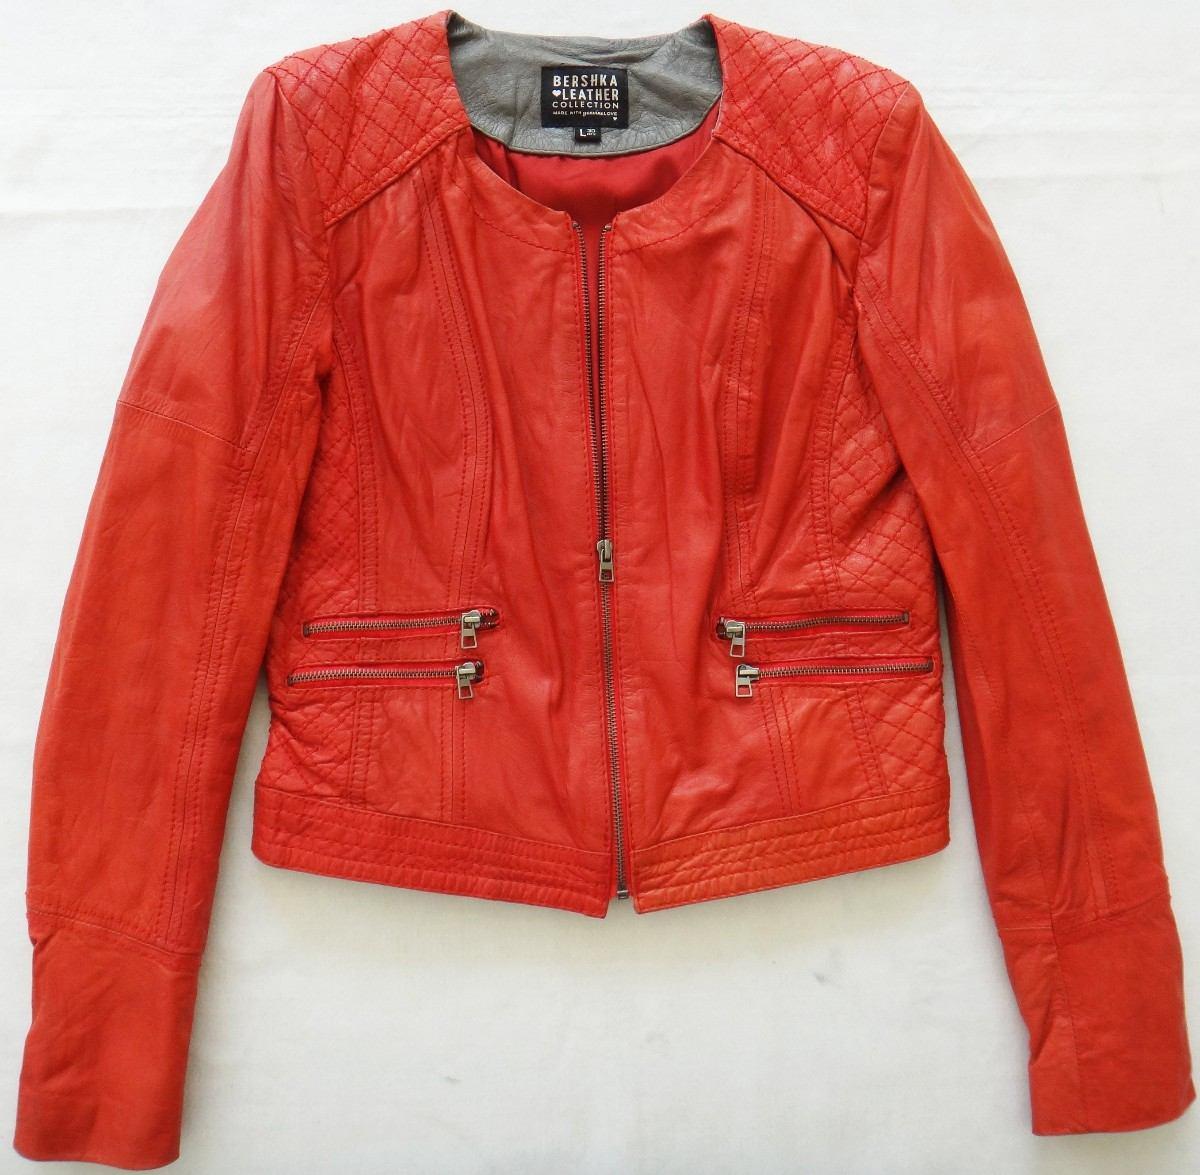 casaco-jaqueta-vermelha-couro-legitimo-bershka-14322-MLB4231159278_042013-F